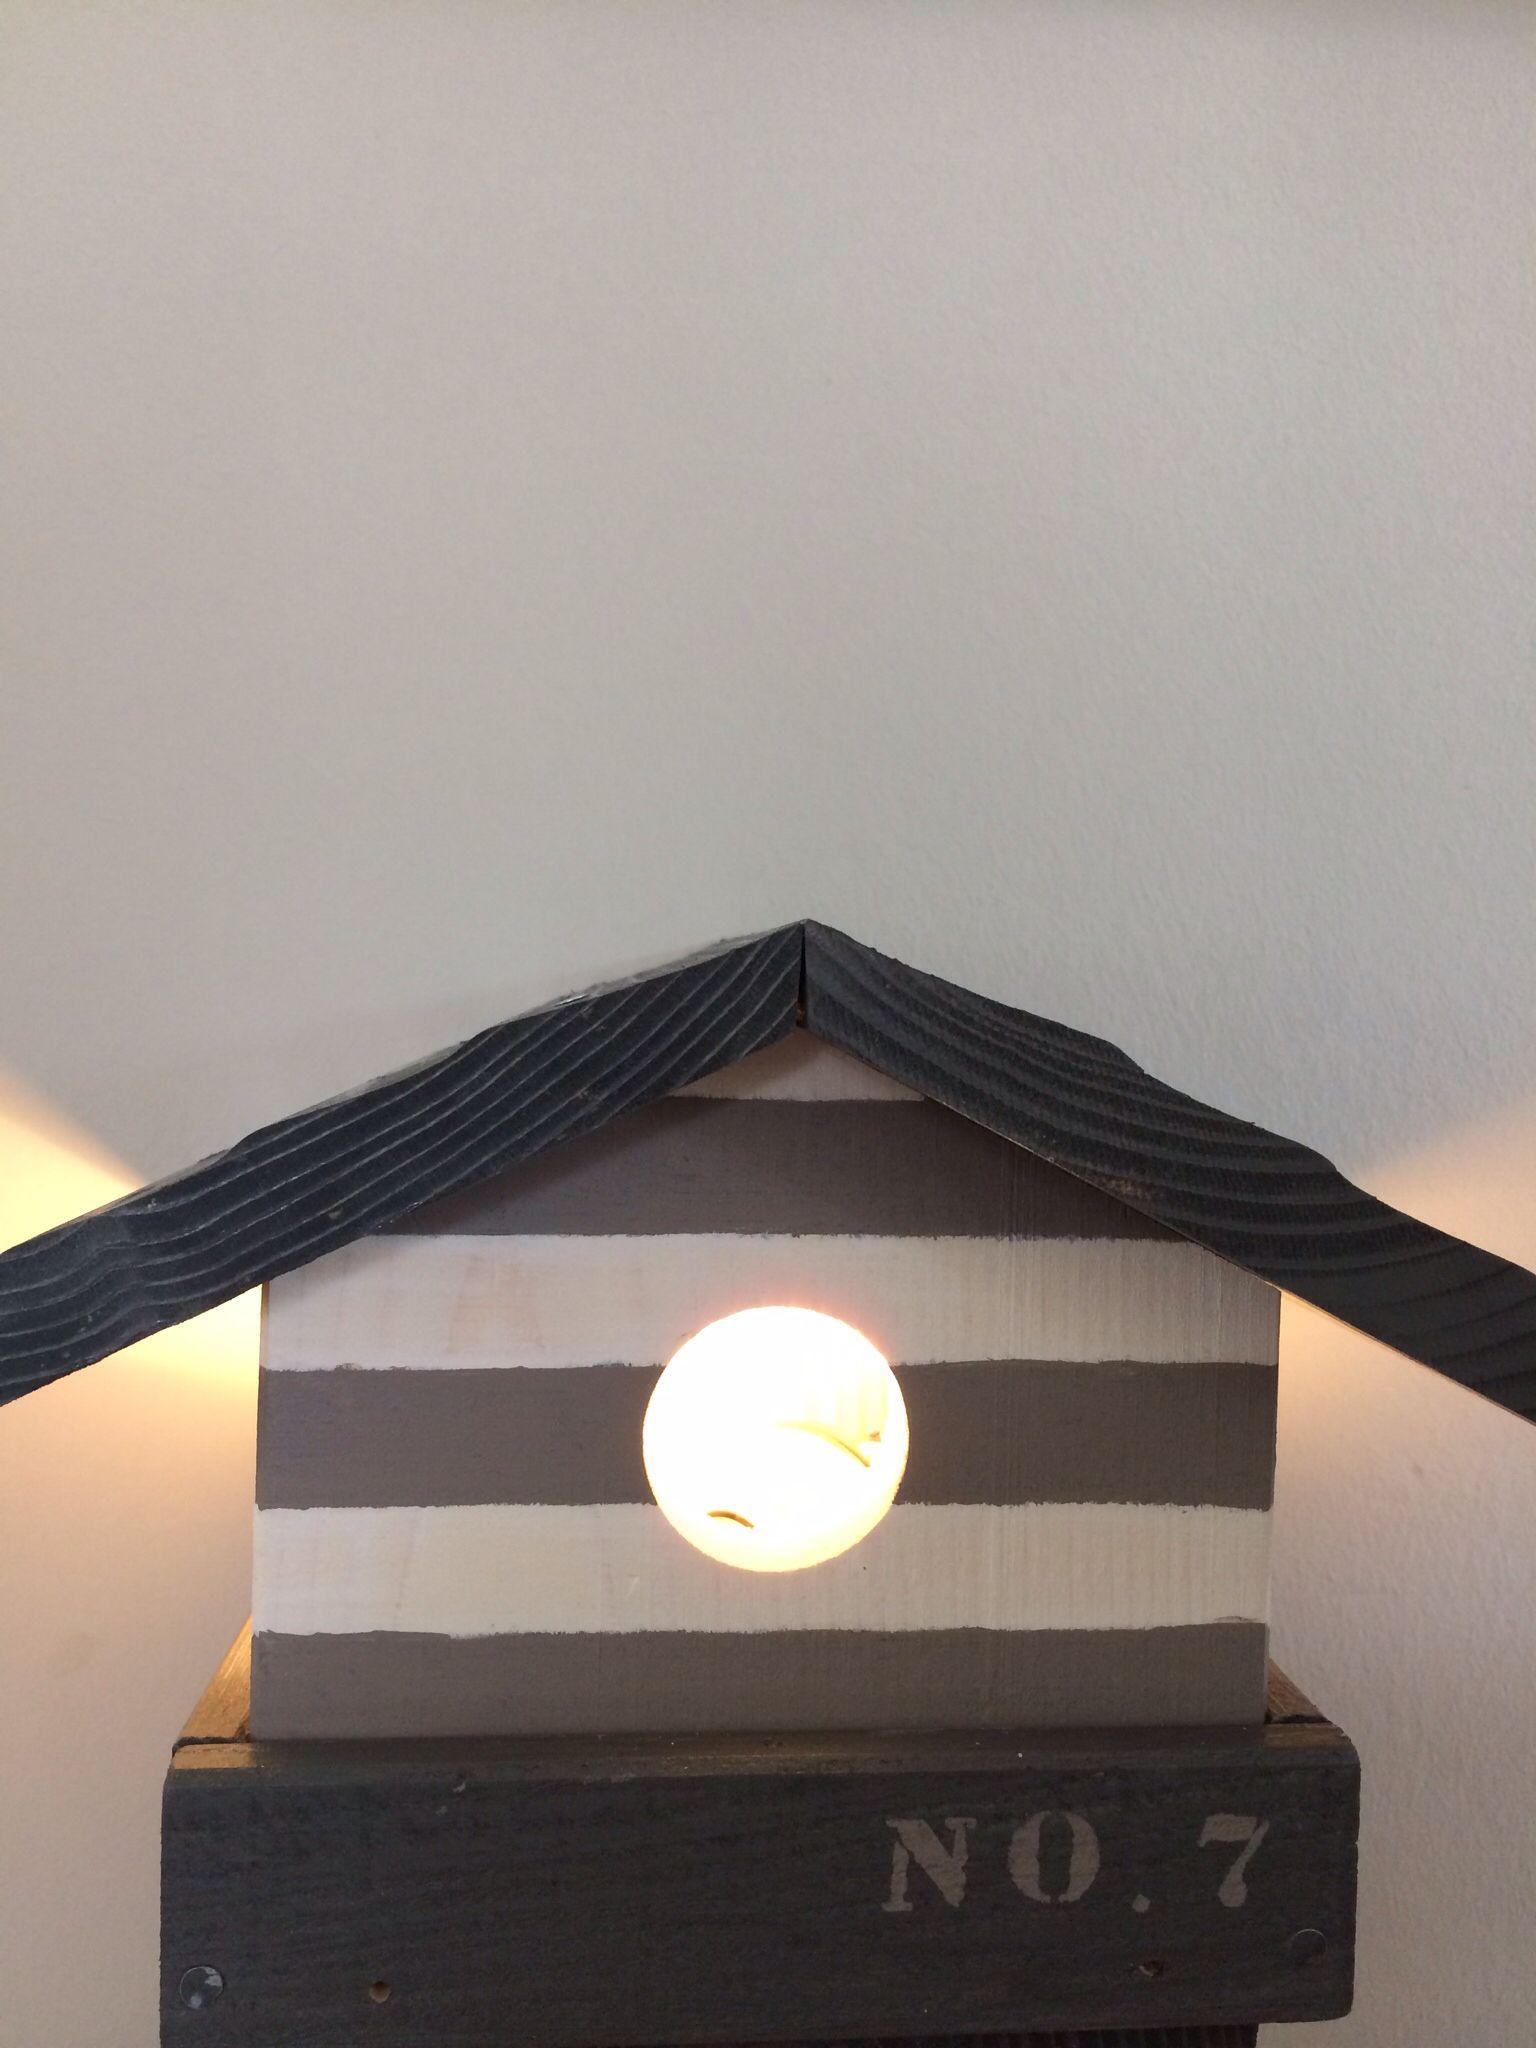 Pin Von Lidisunny Auf My Creativity Lampe